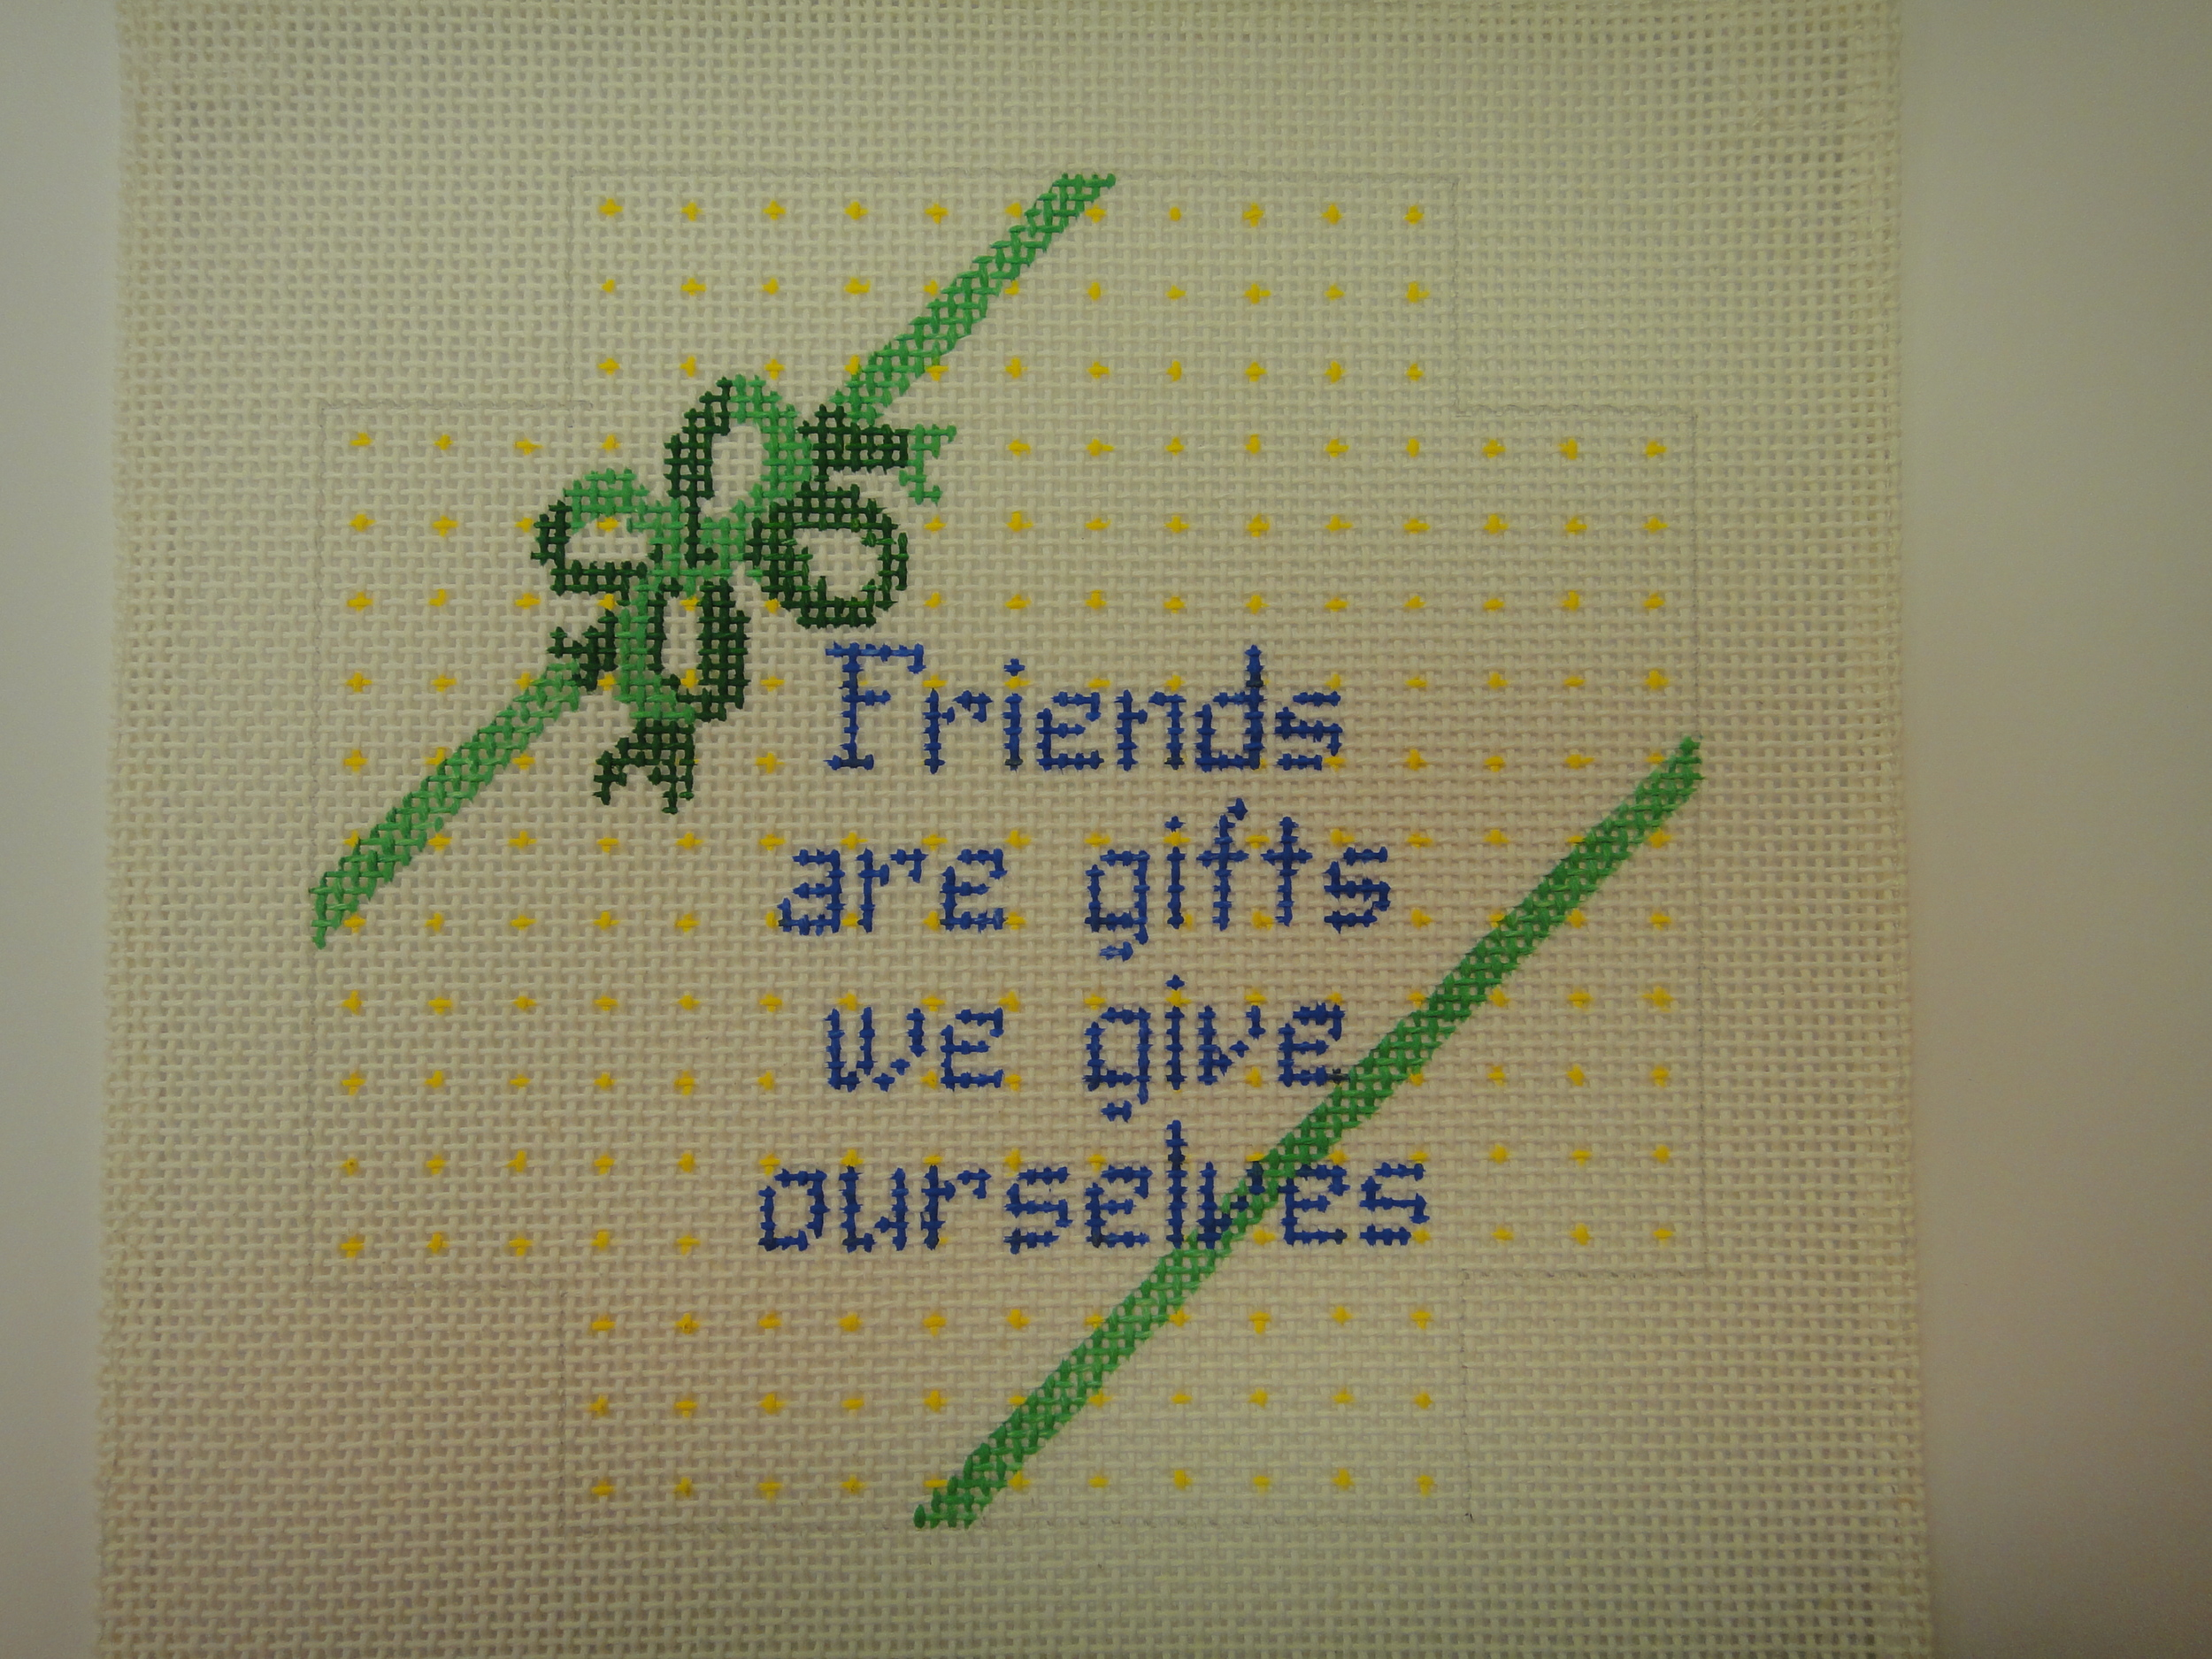 S38 Friends Gift (6x6)